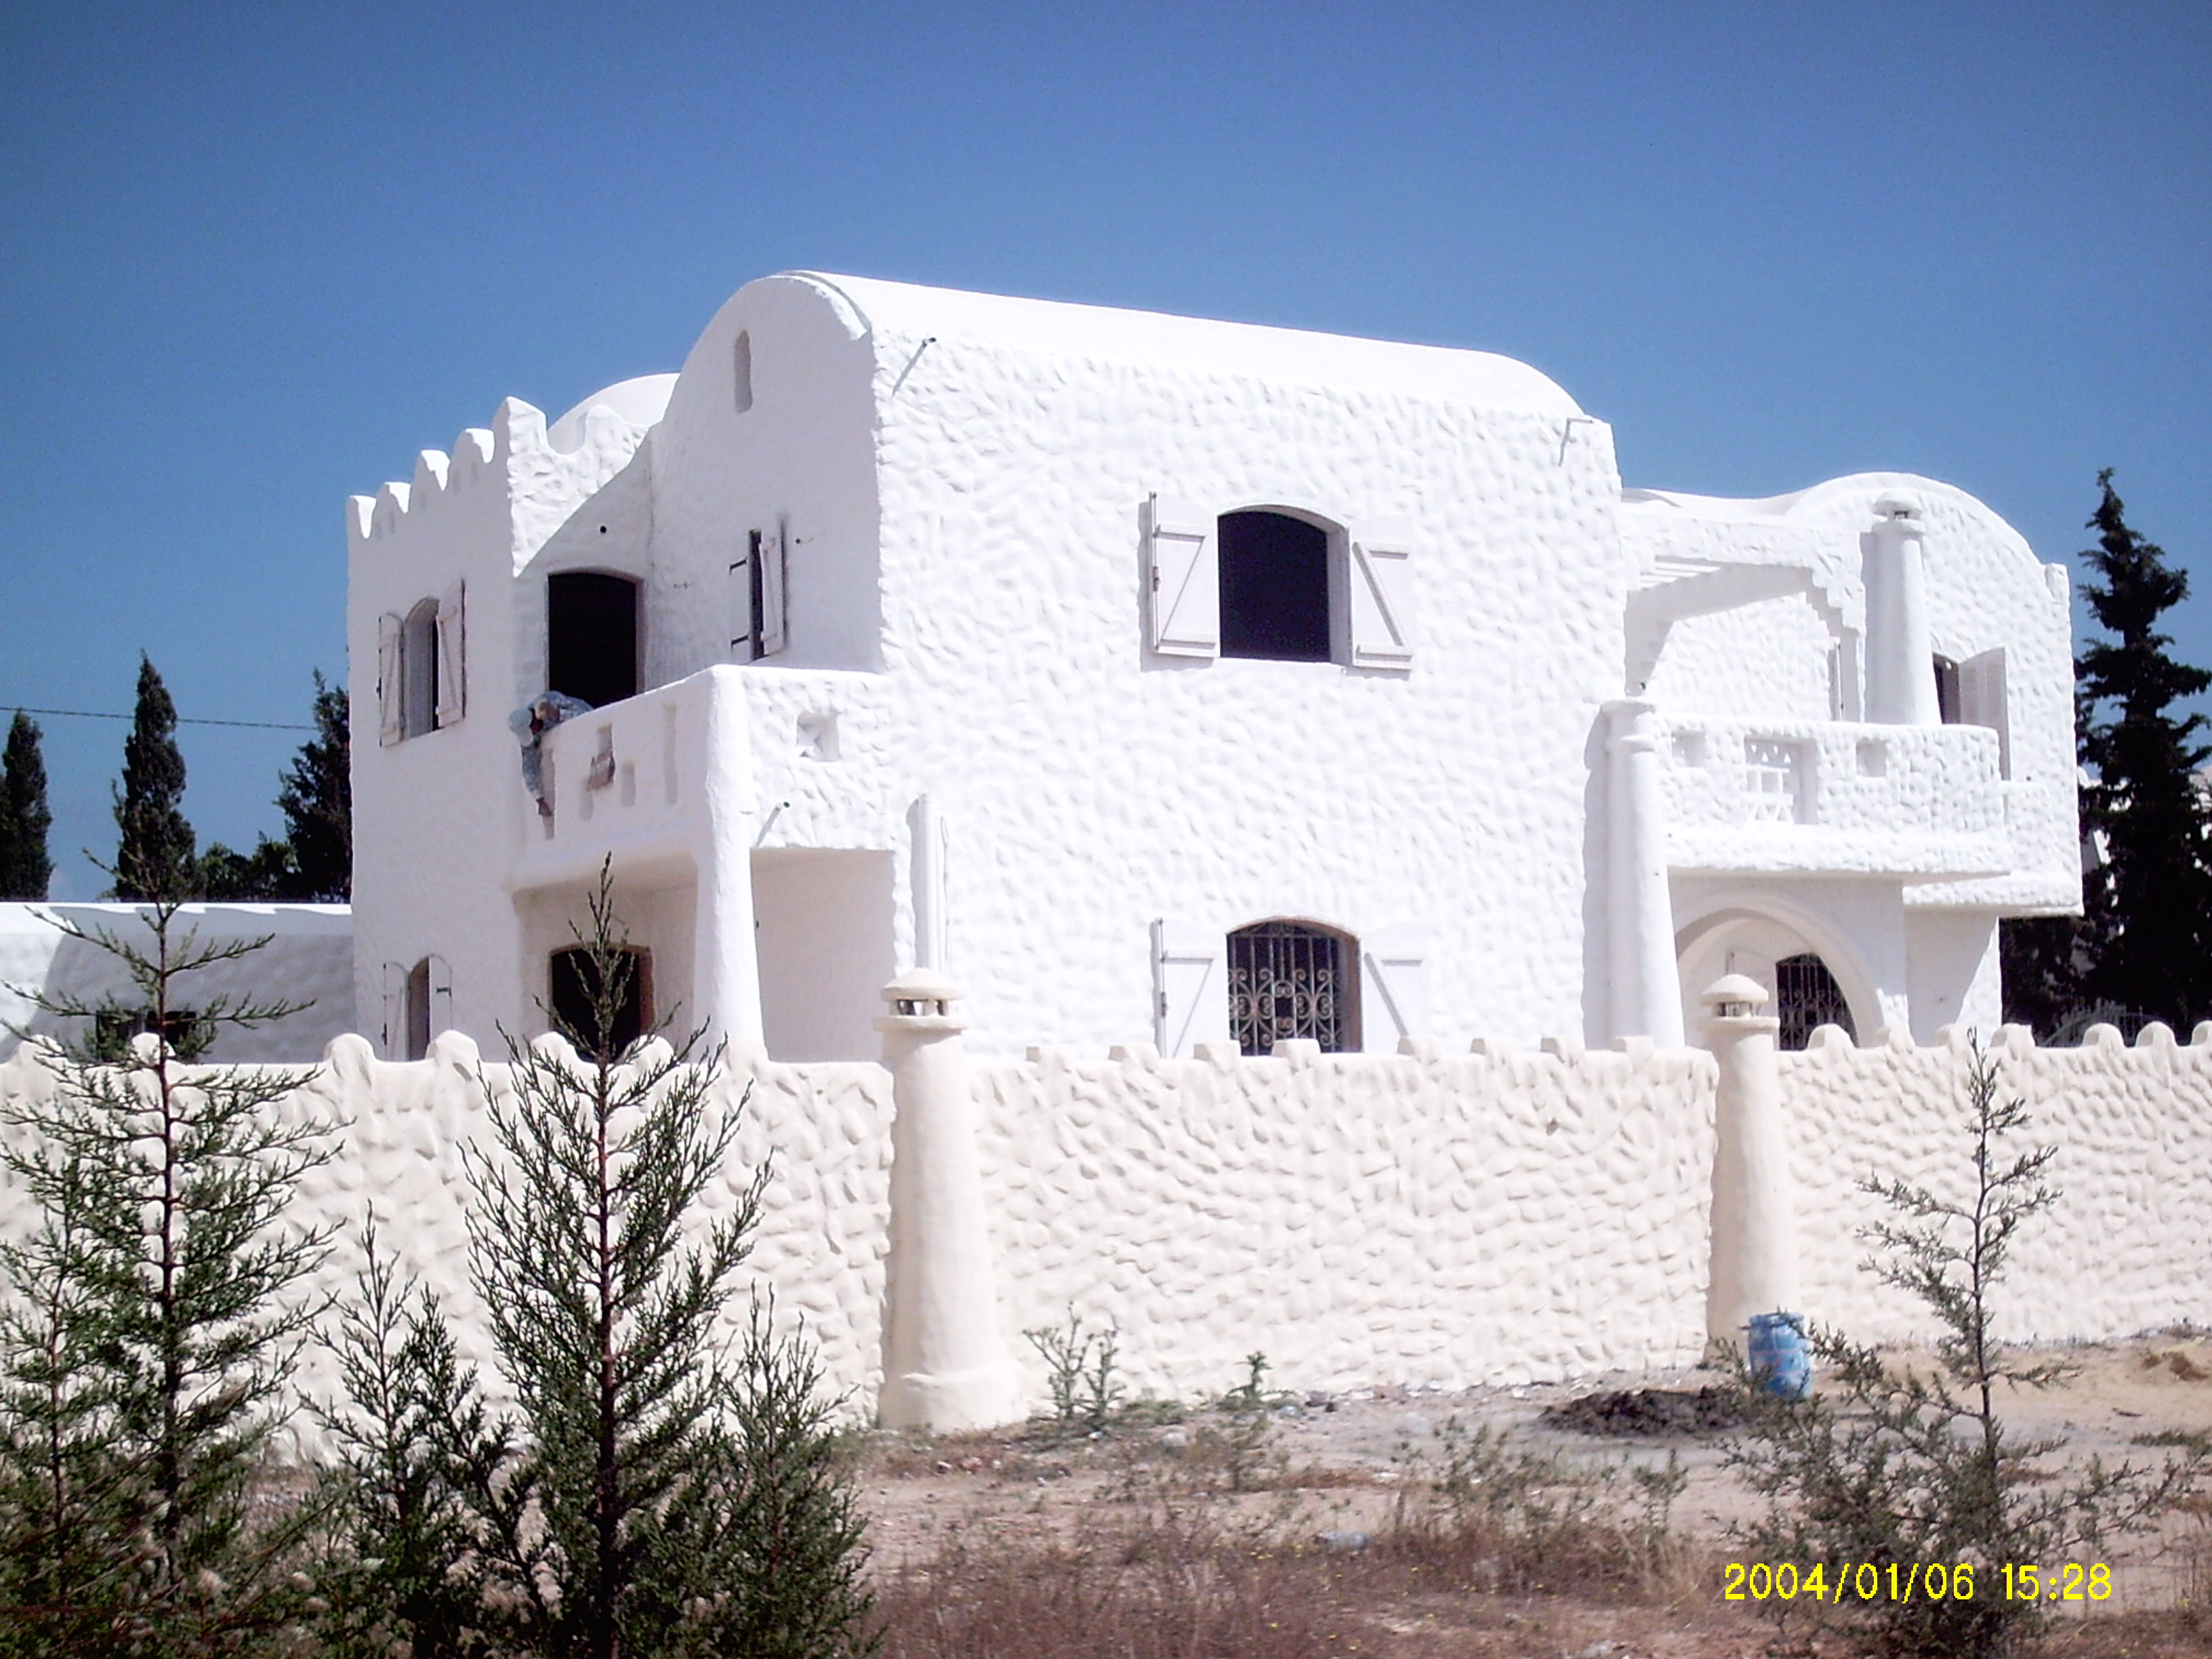 Achat maison tunisie zarzis ventana blog for Achat maison zarzis